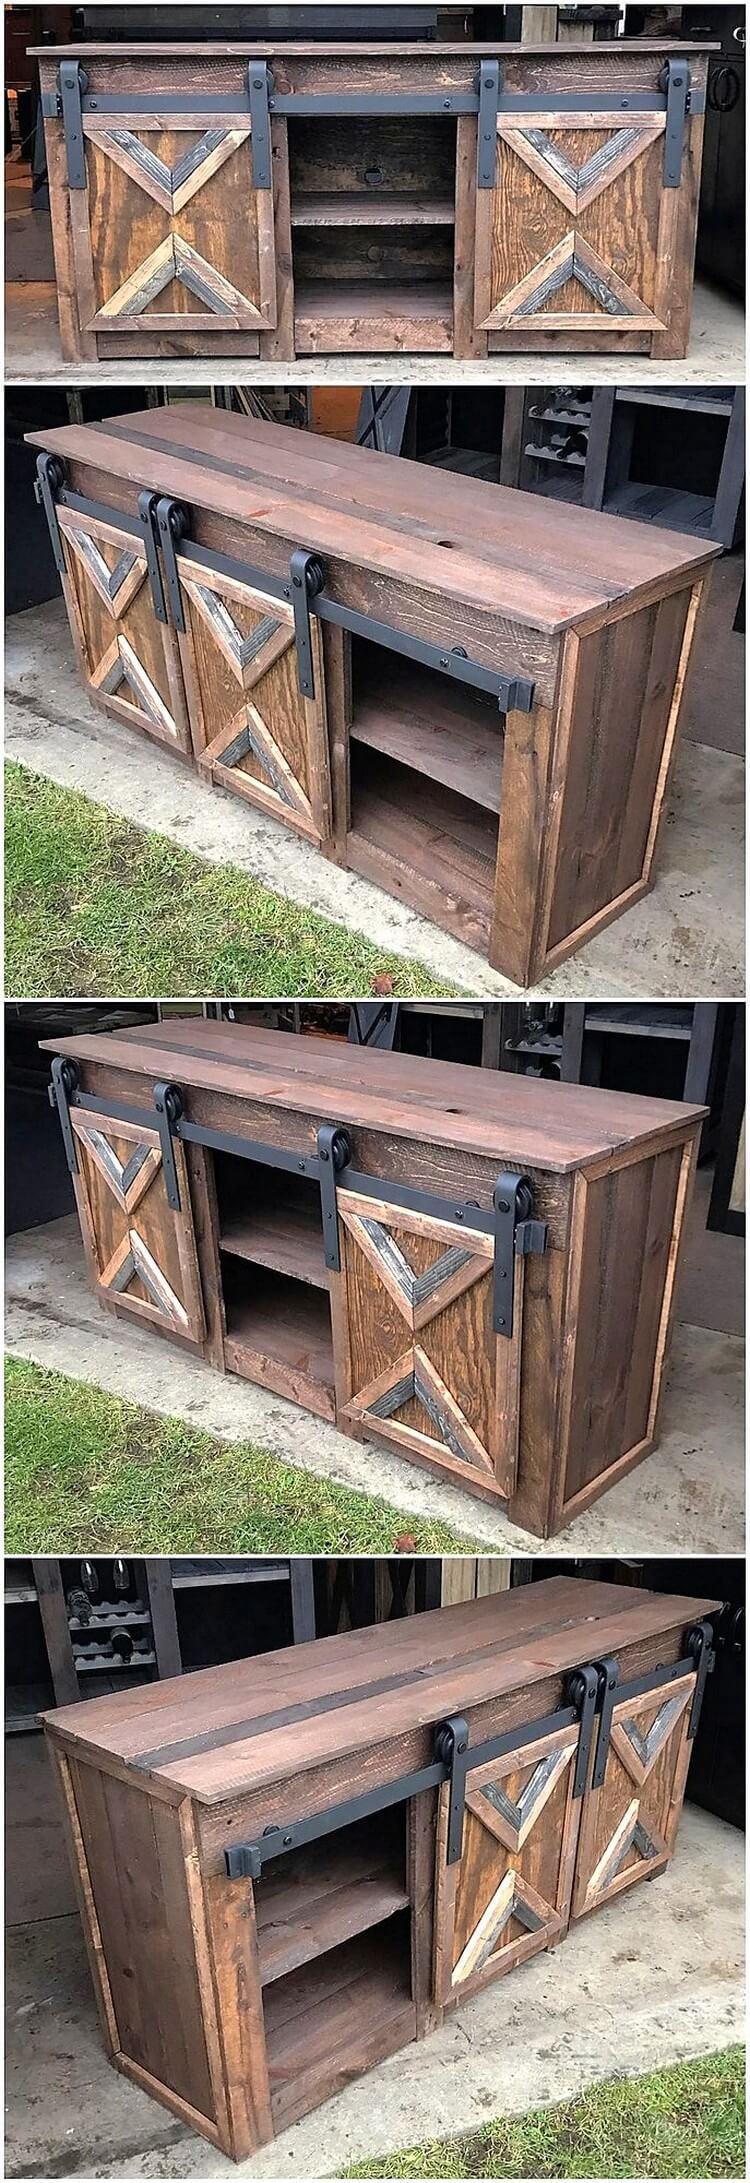 Wooden Pallet Cabinet with Sliding Doors